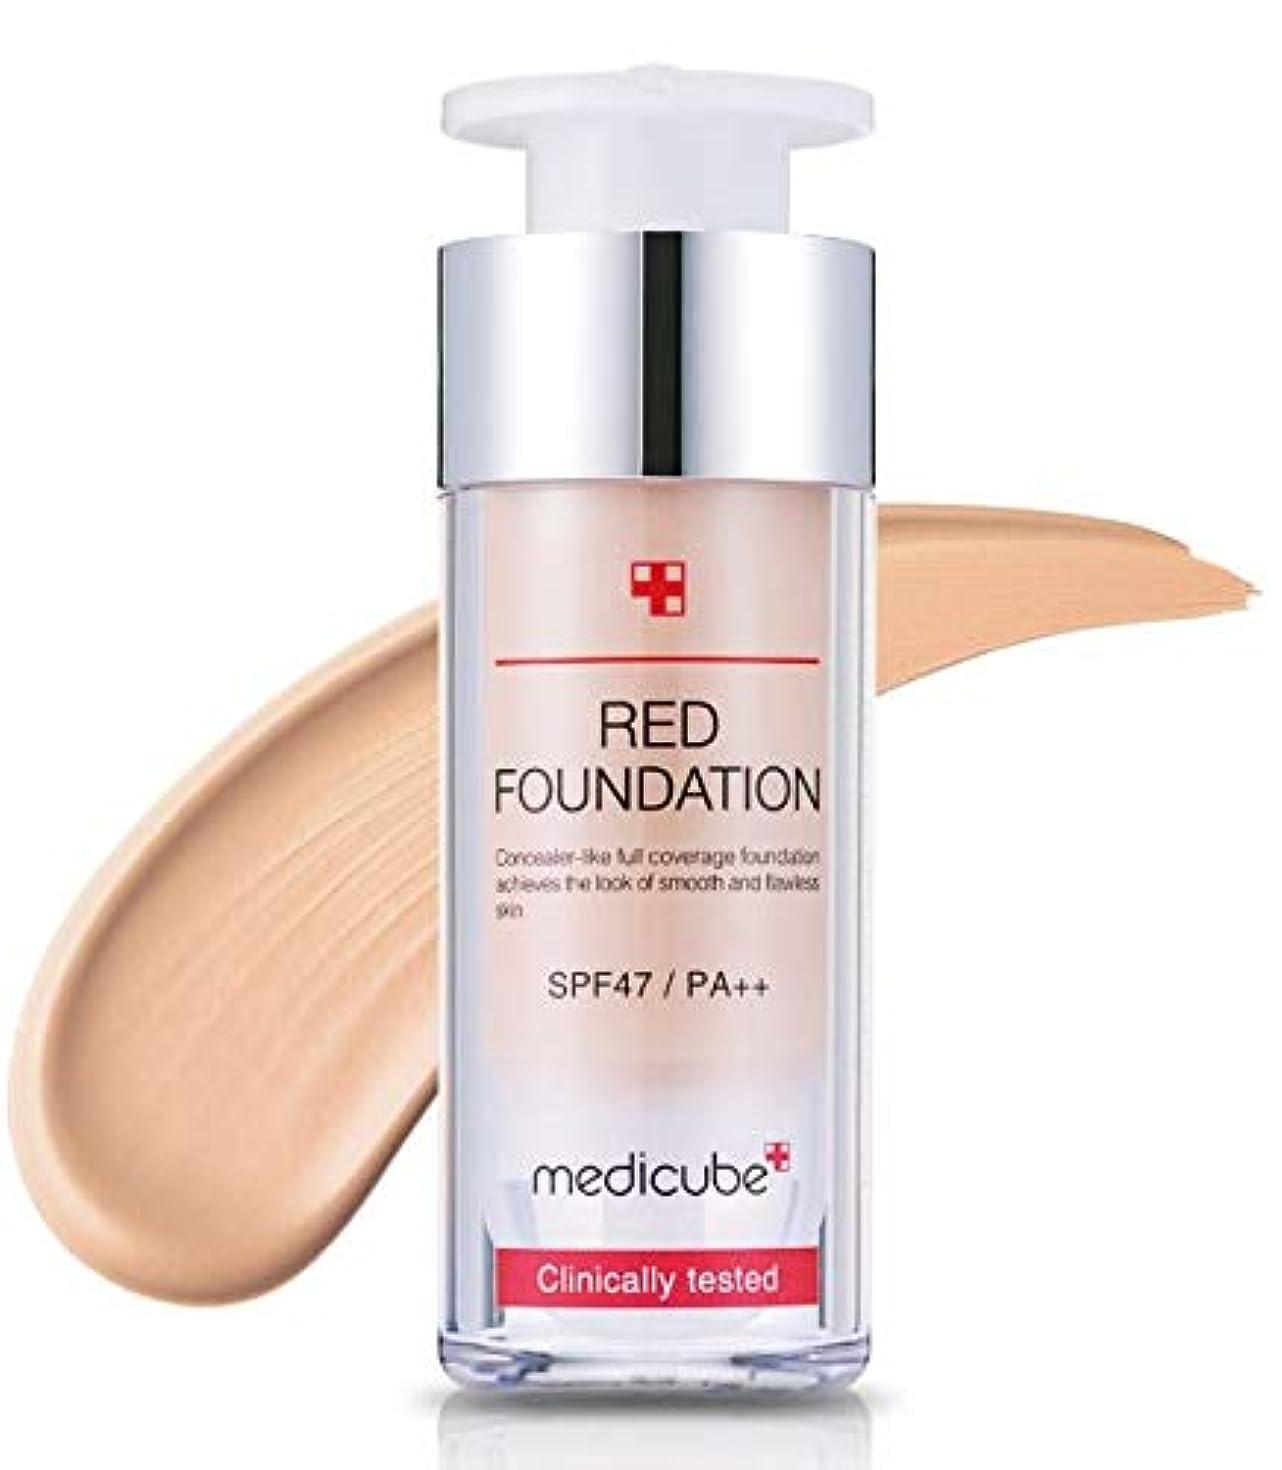 Medicube Red Foundation 40 g/メディキューブレッドファンデーション 40g (#22) [並行輸入品]